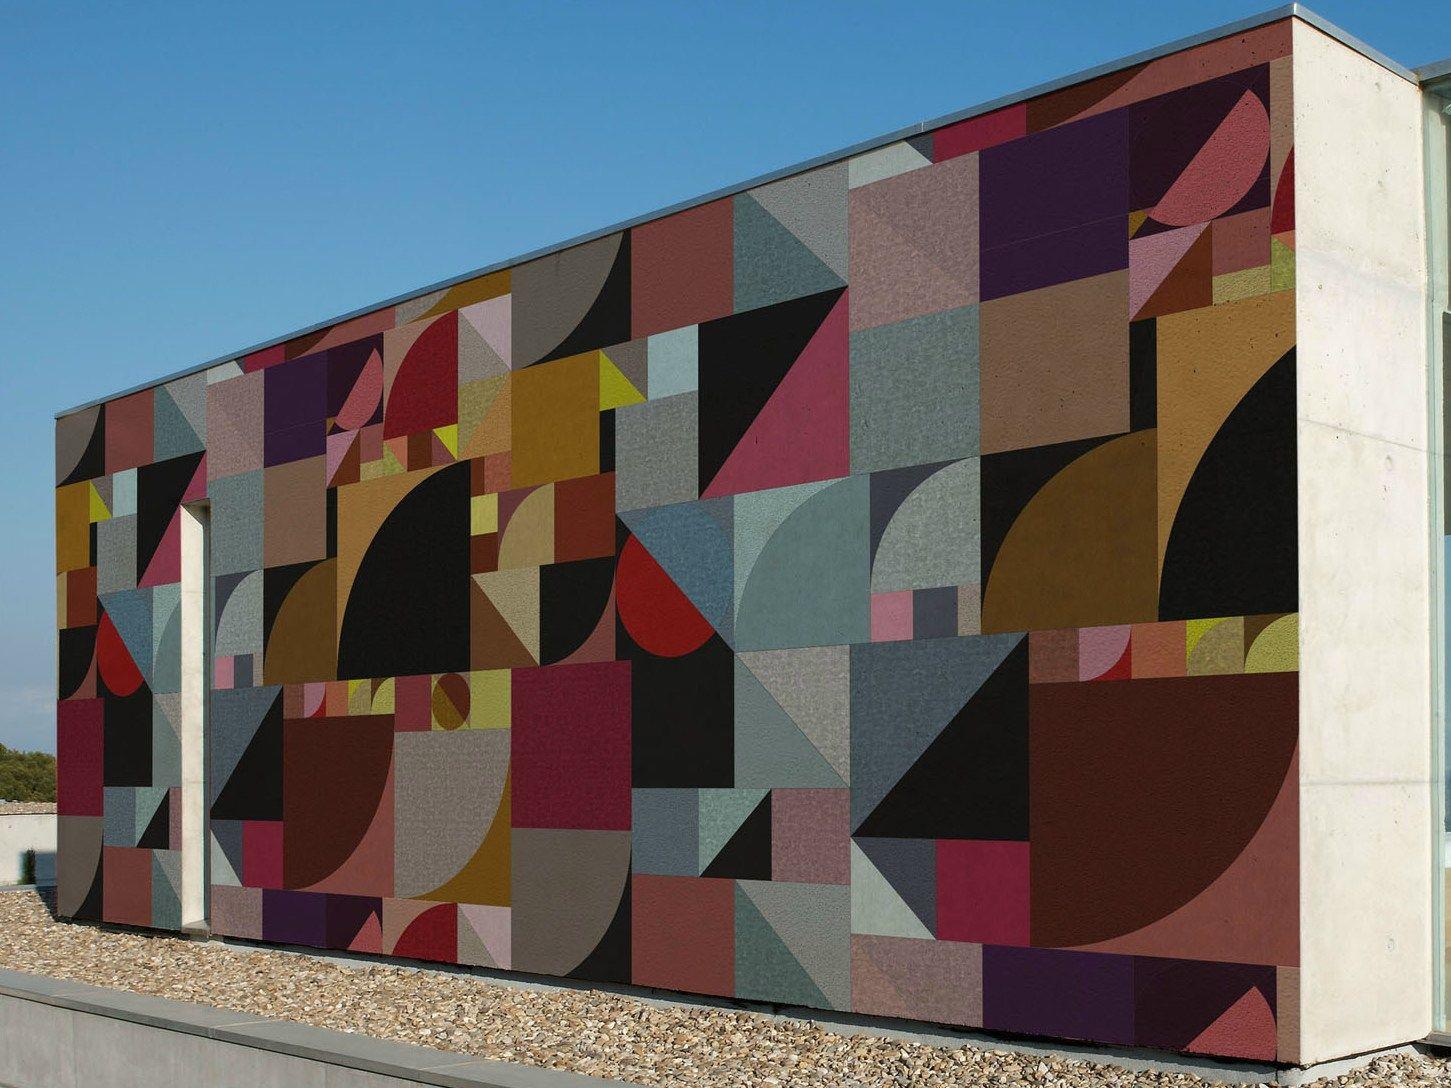 Carta da parati geometrica per esterni bauhaus by wall for Bauhaus 3d tapete